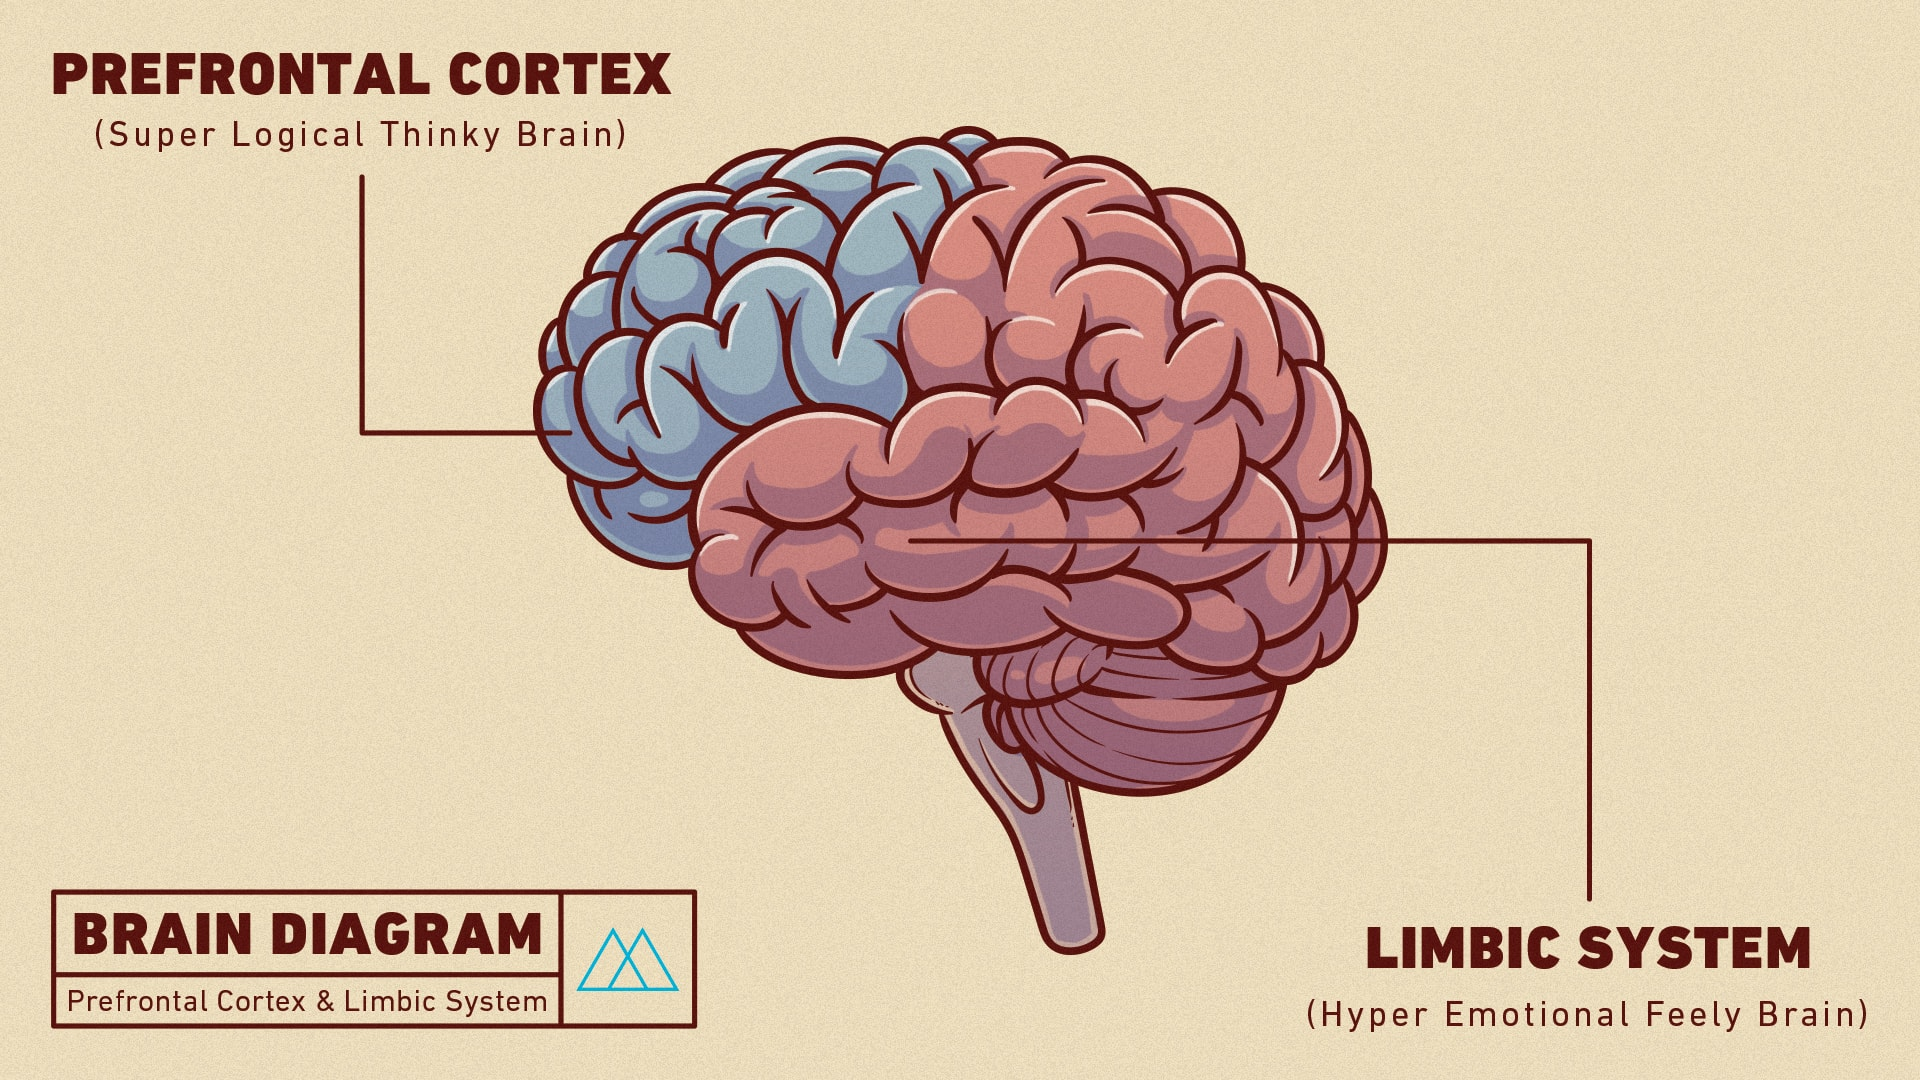 brain diagram prefrontal cortex images